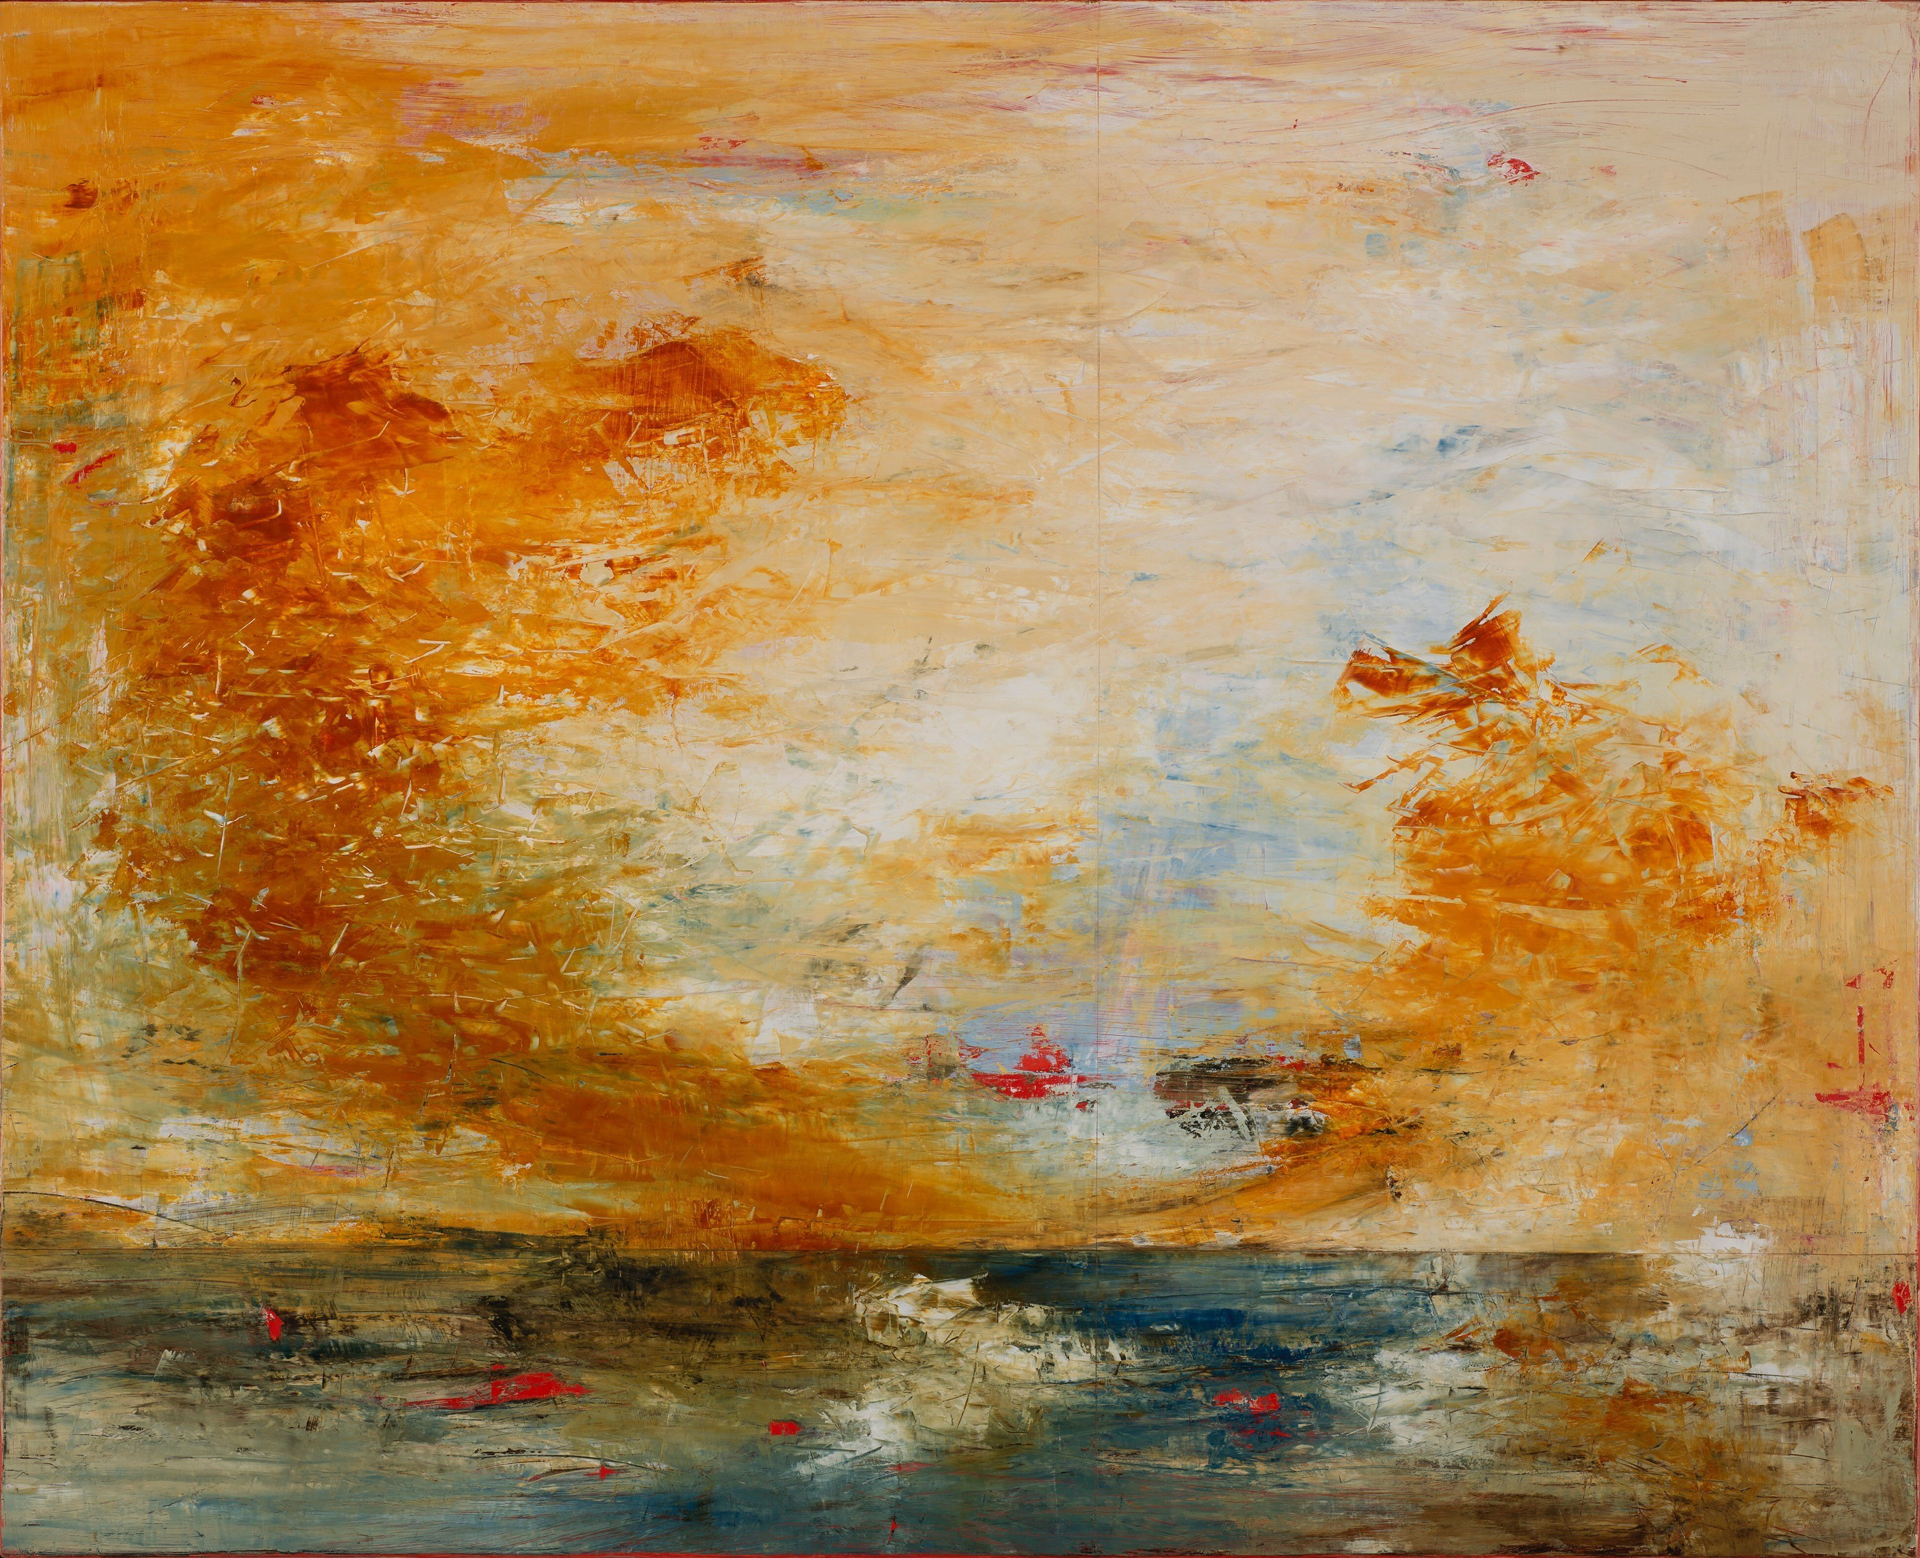 In the Morning Light No. 5 by Peter Burega (b. 1965)